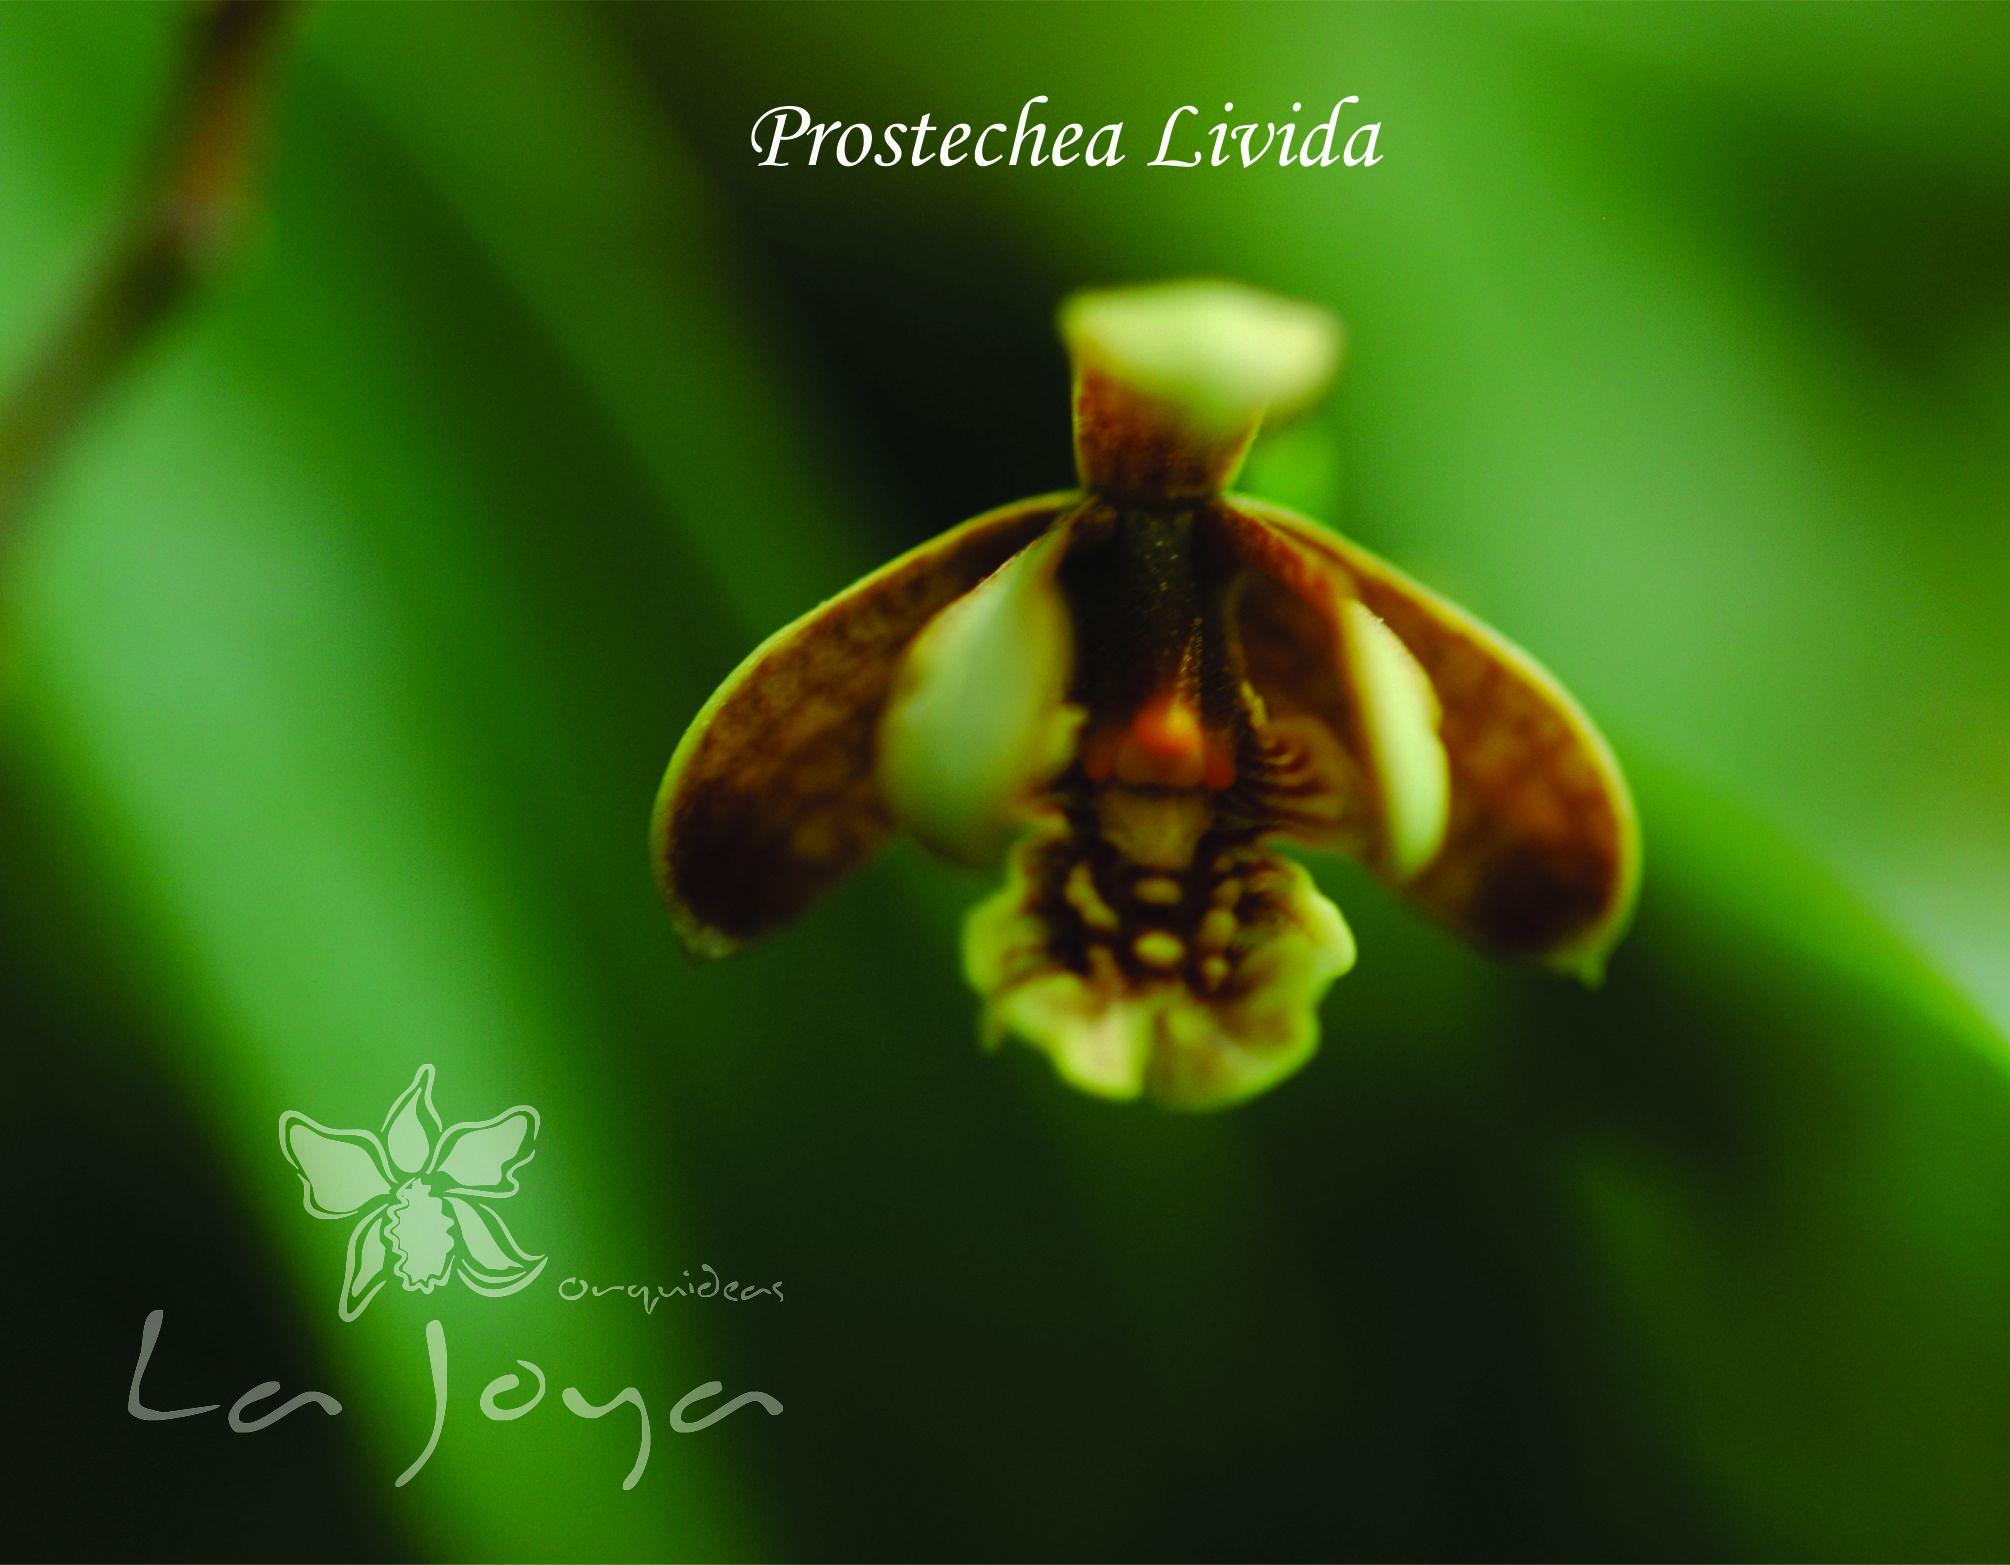 Prostechea Livida